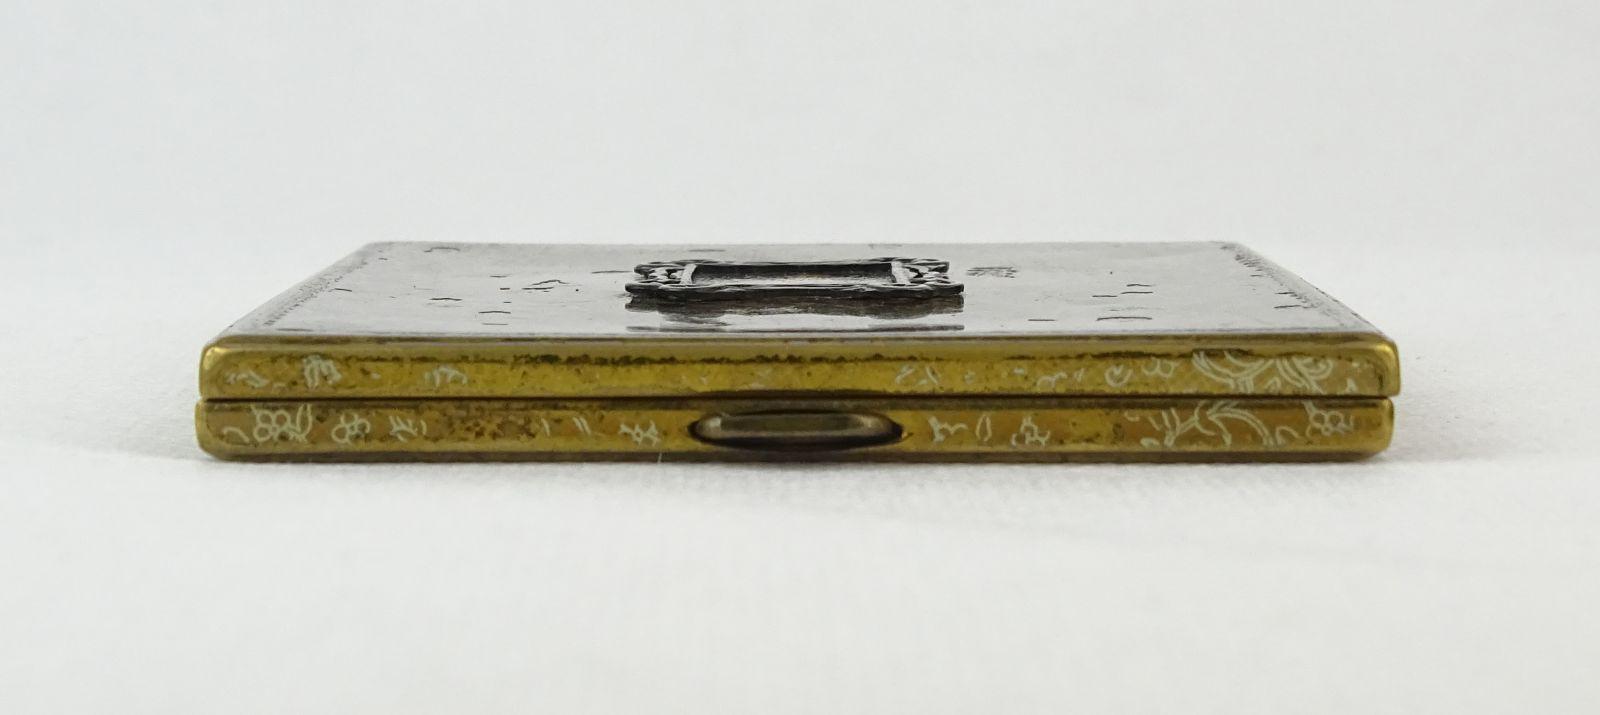 DSC00406.JPG (1600×715)